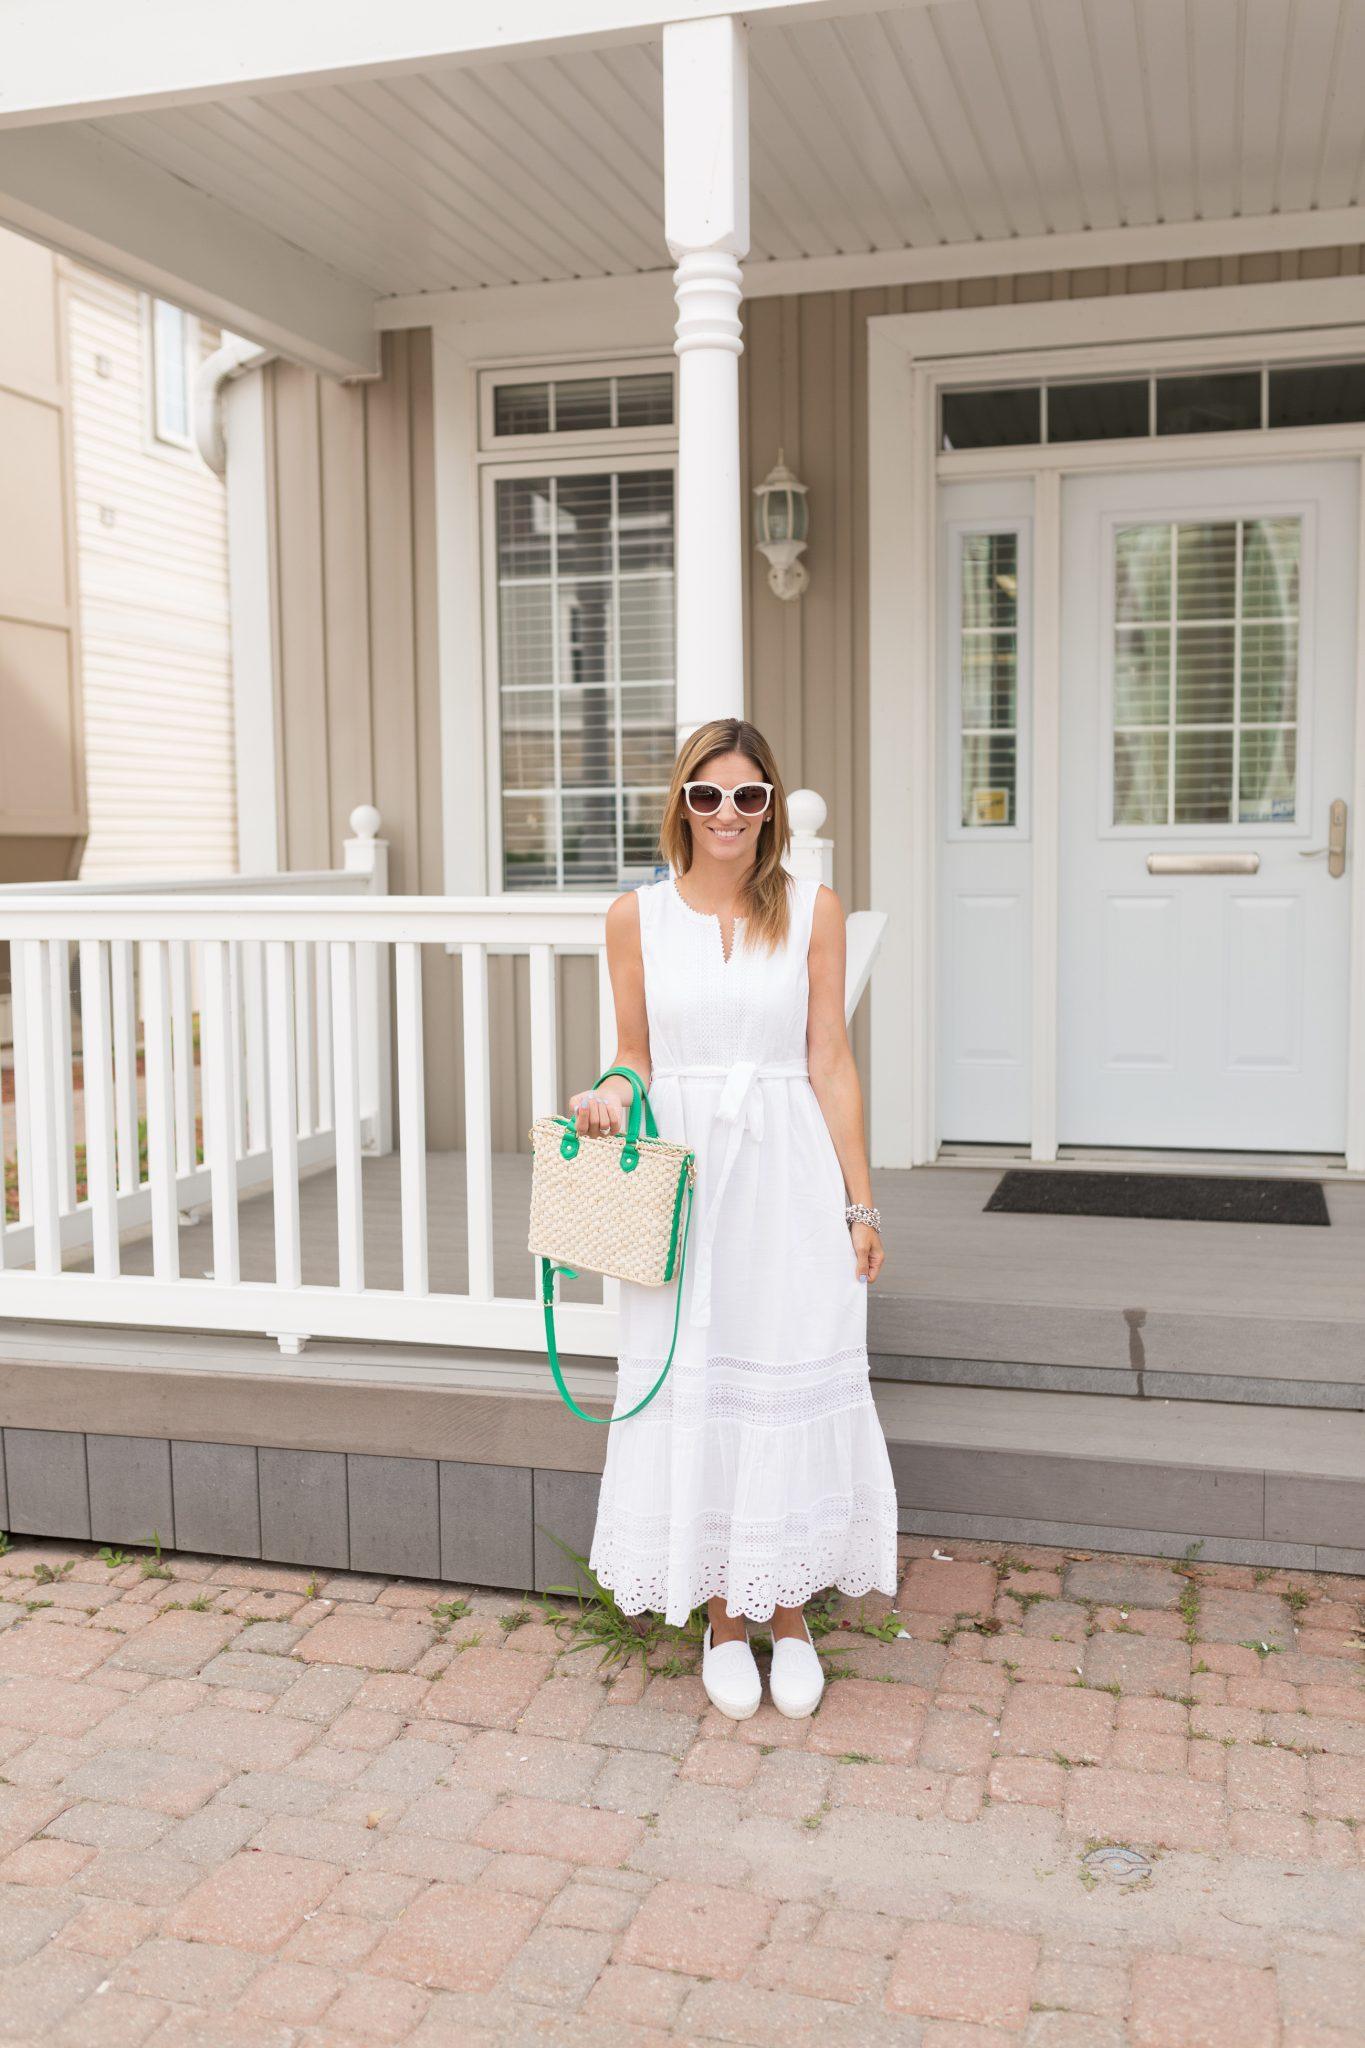 TalbotsEmbroidered-Eyelet & Lace Maxi Dress, wicker cross body bag, white chanel espadrilles, white cat-eye sunglasses sparkleshinylove